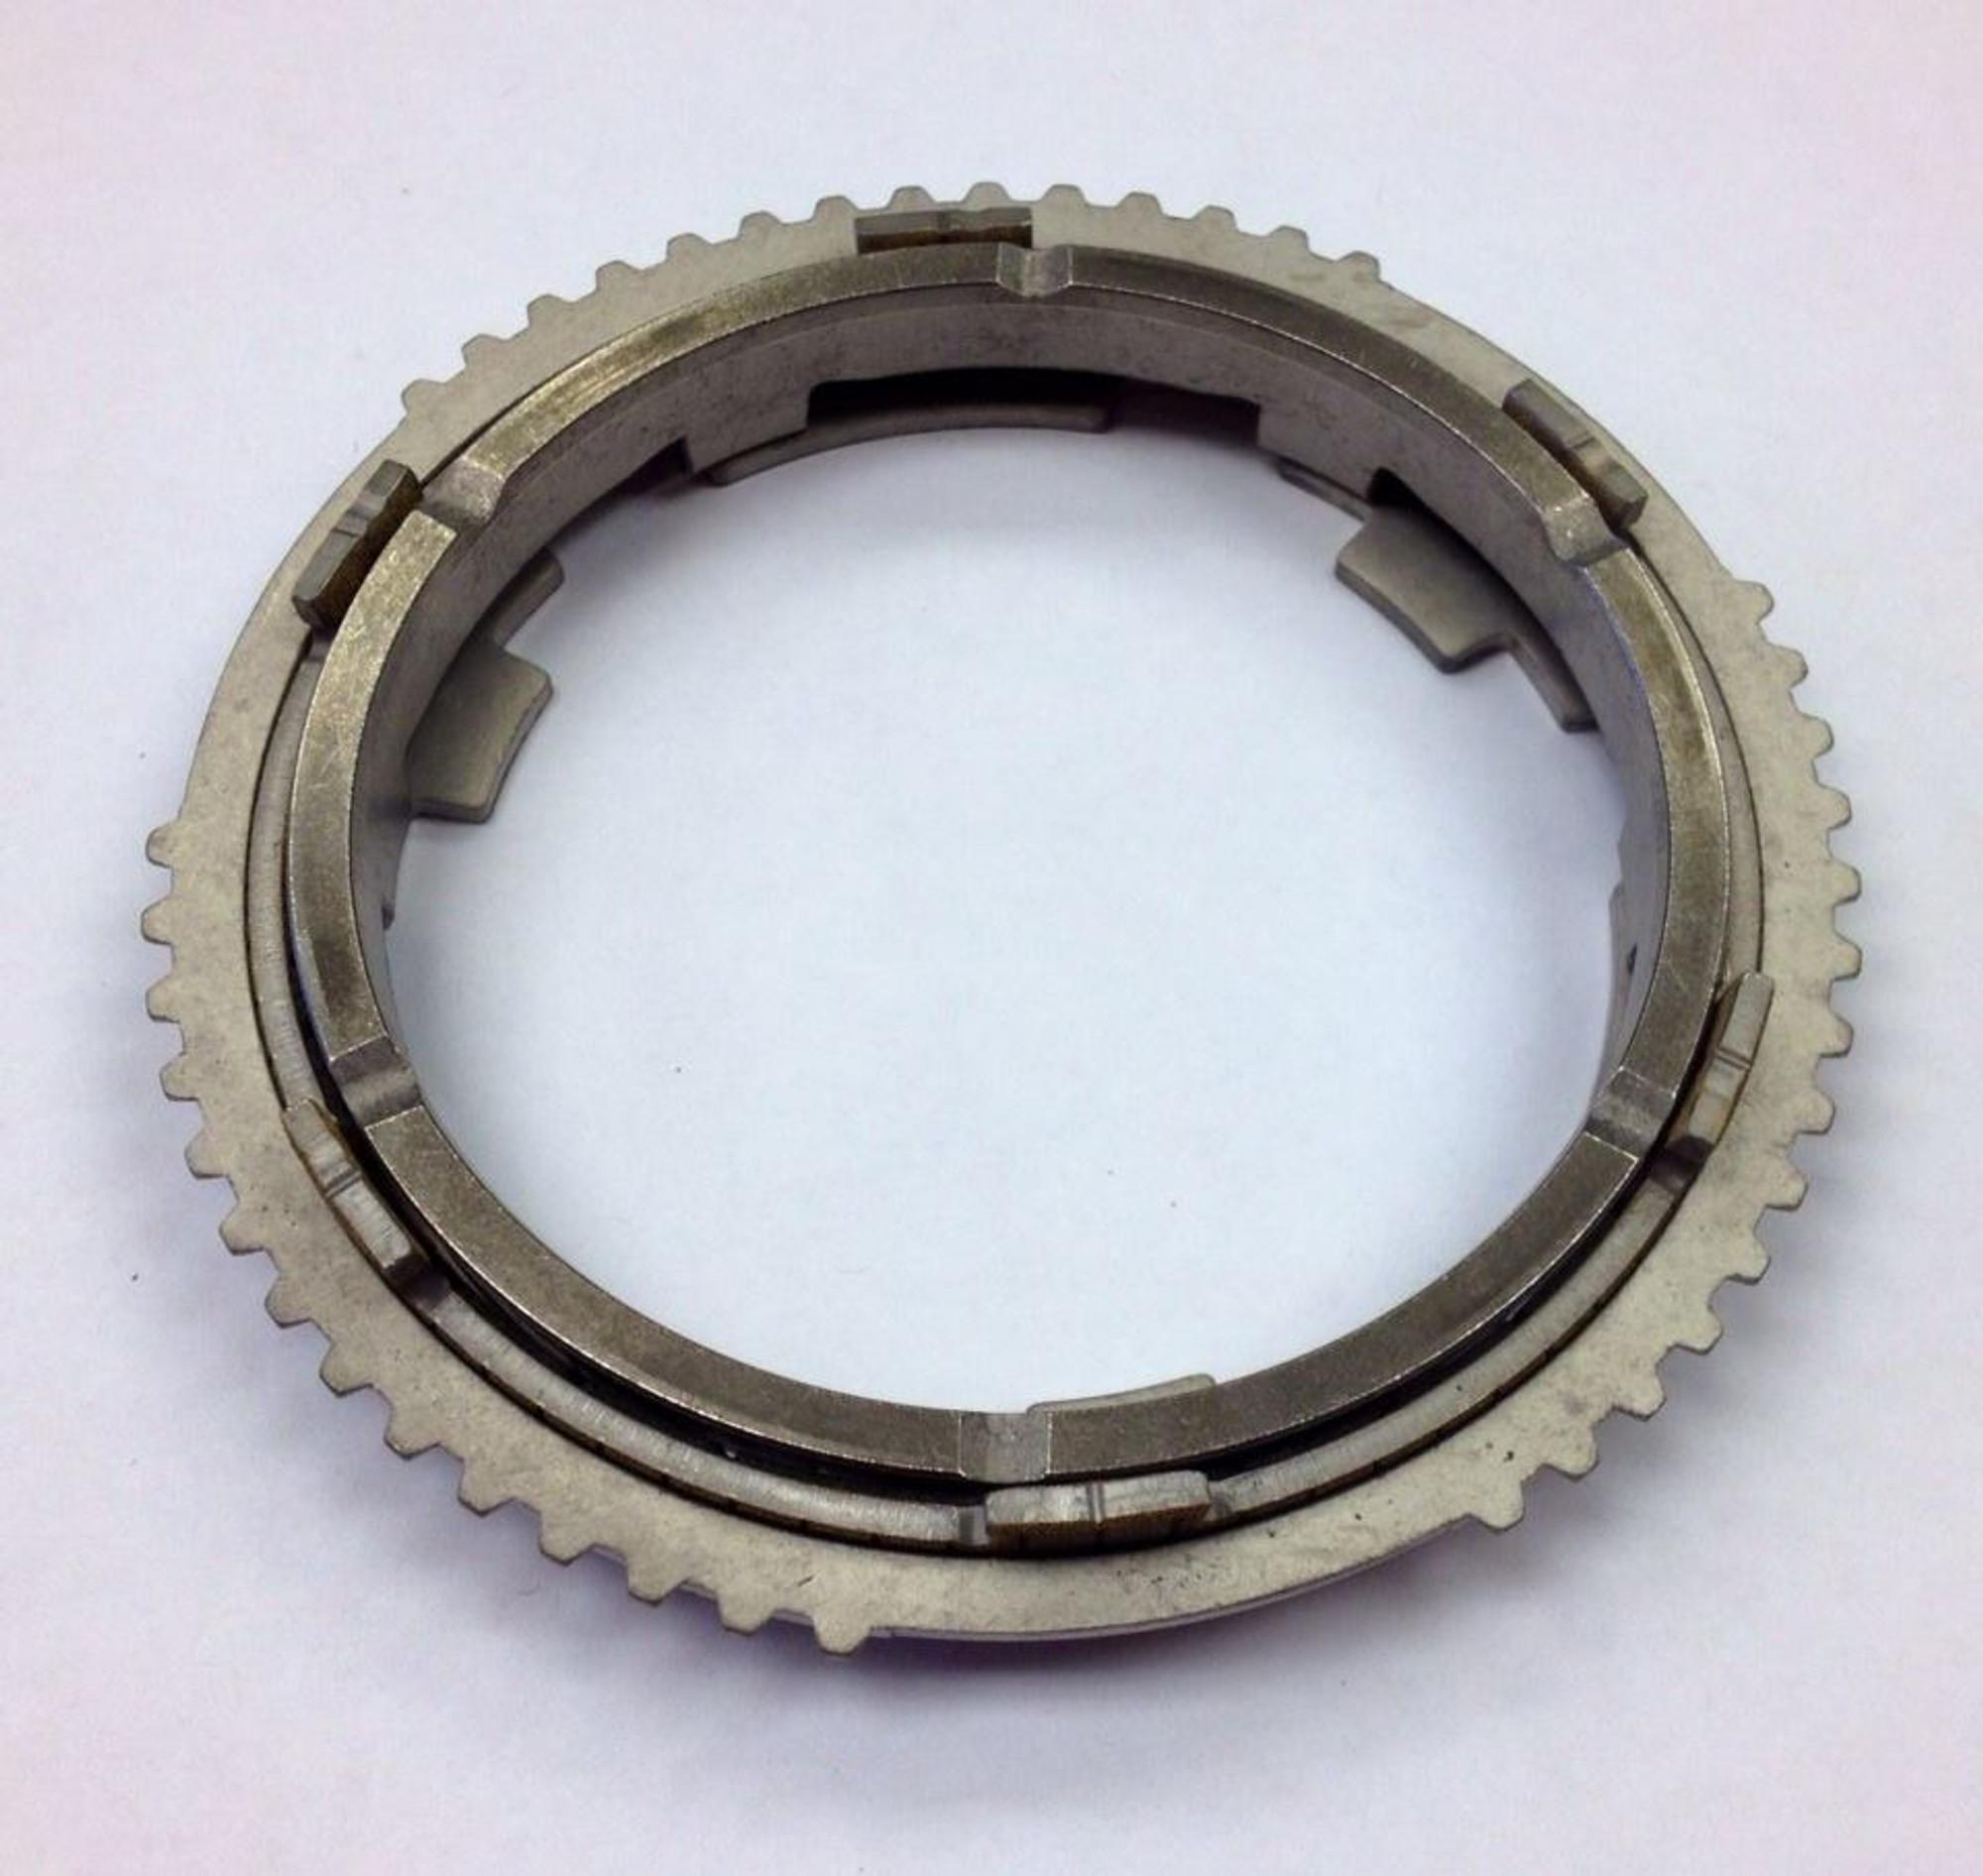 Tremec TR6060 Reverse Gear Synchronizer Carbon Blocker Ring Kit Set of 3